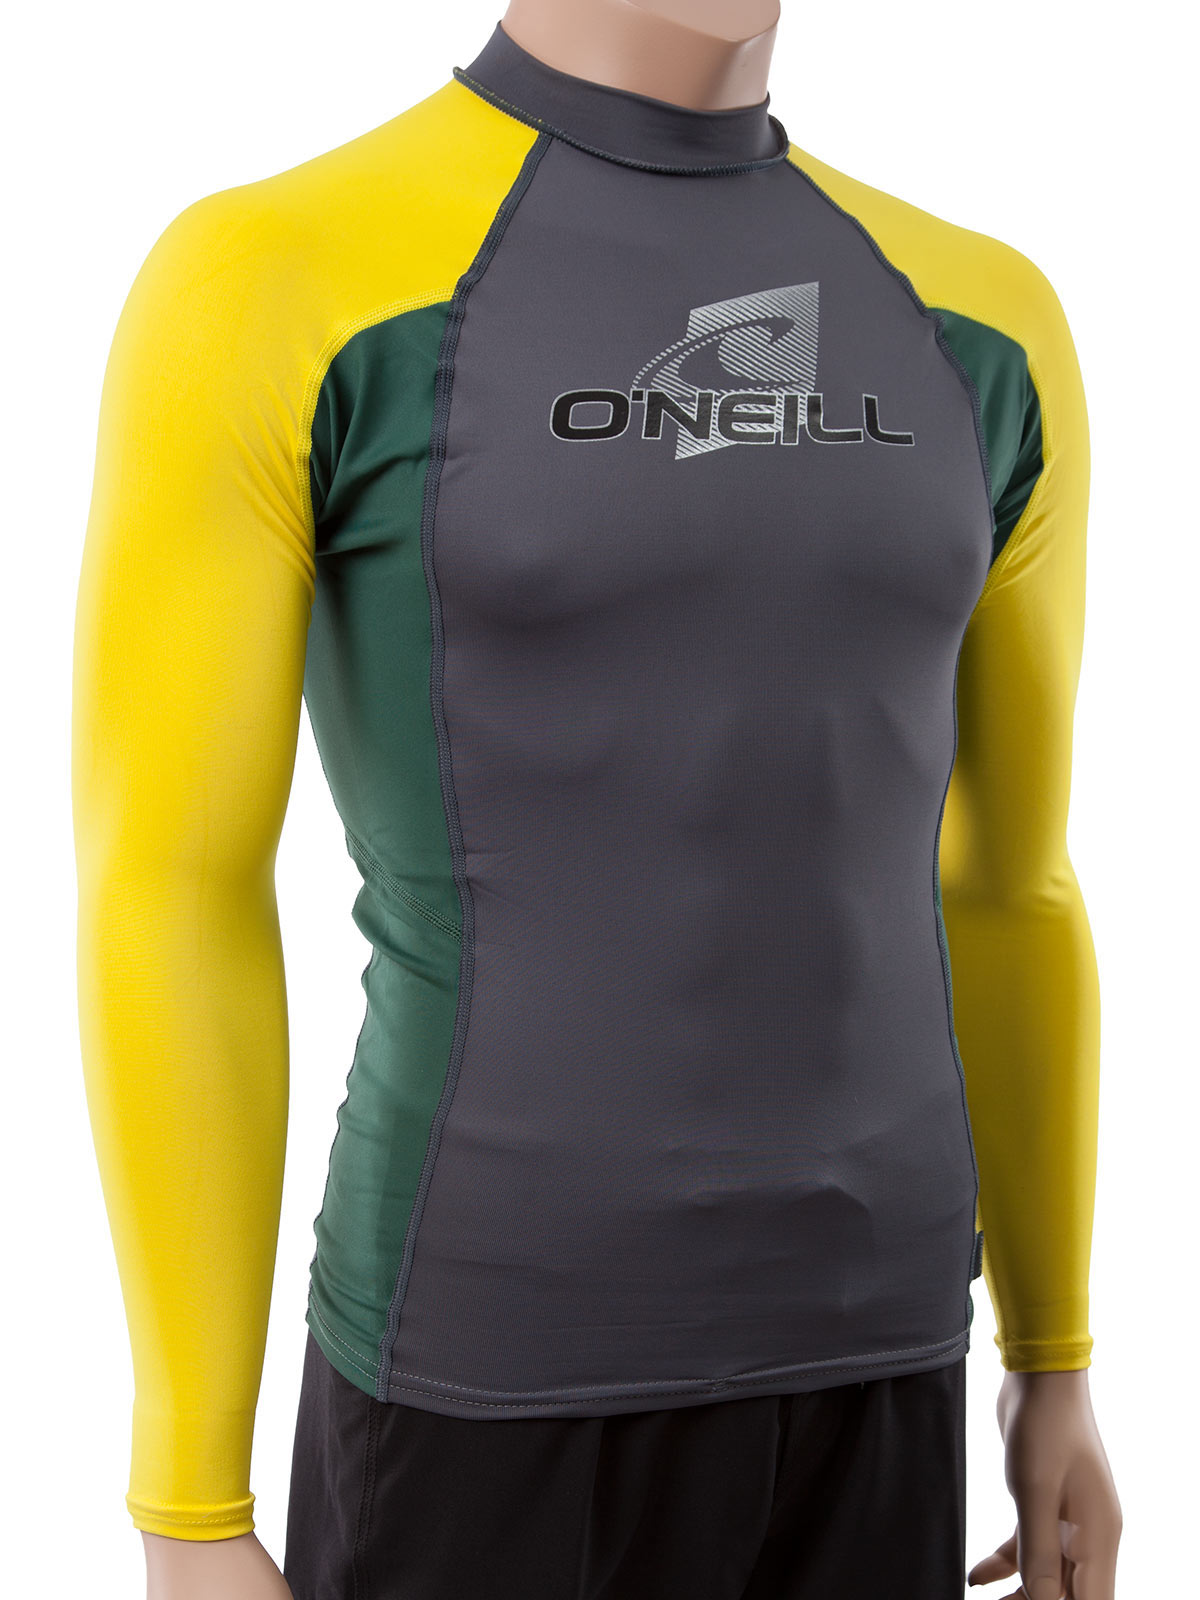 ONeill-mens-long-sleeve-rashguard-Lycra-swim-shirt-with-50-UV-protection